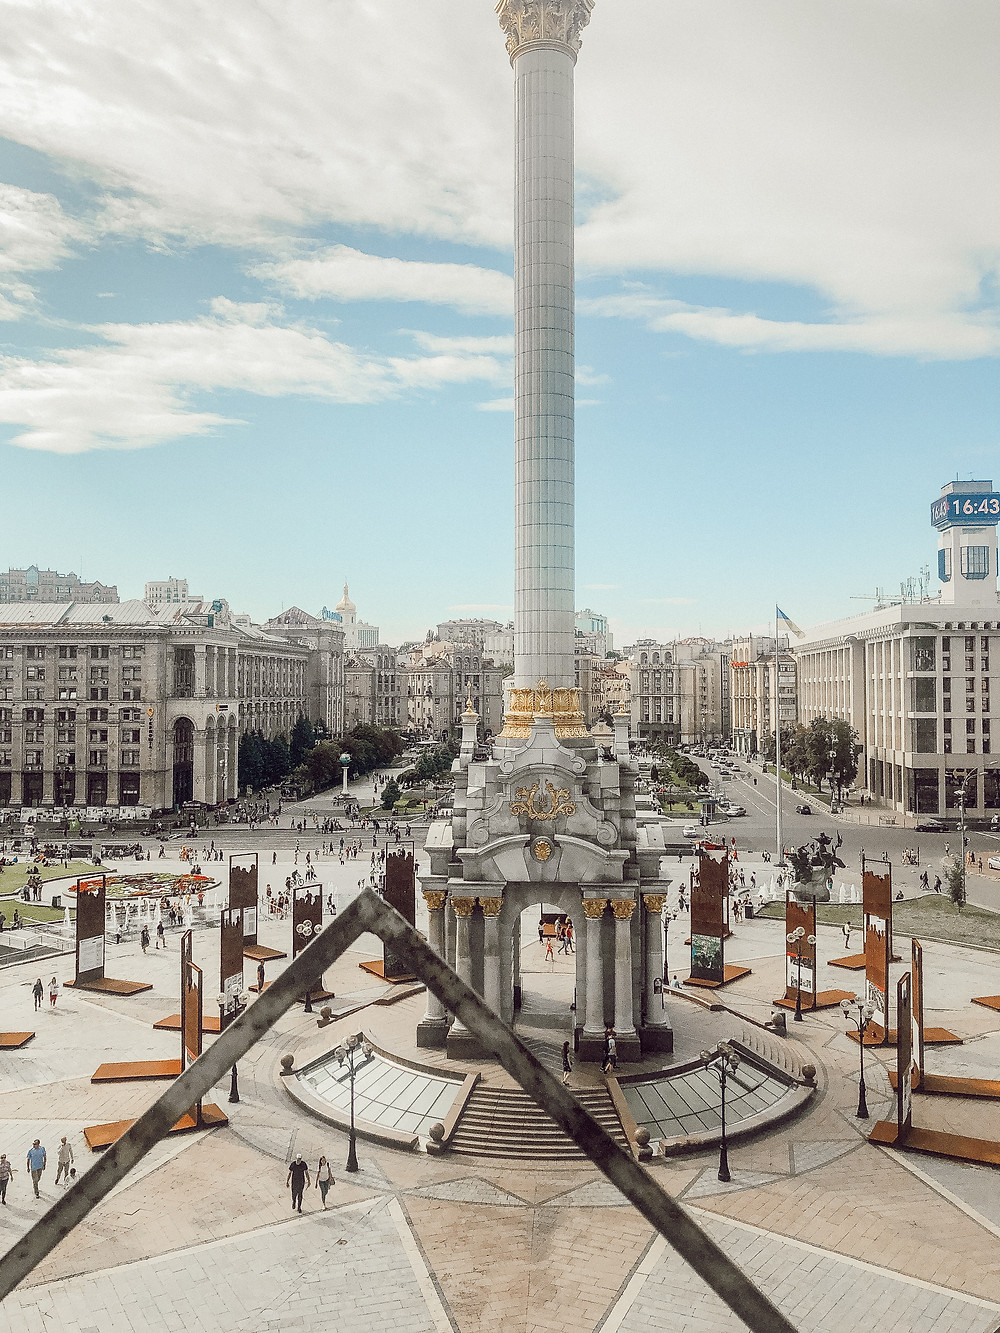 Maidan Nezalezhnosti, Kyiv, Ukraine